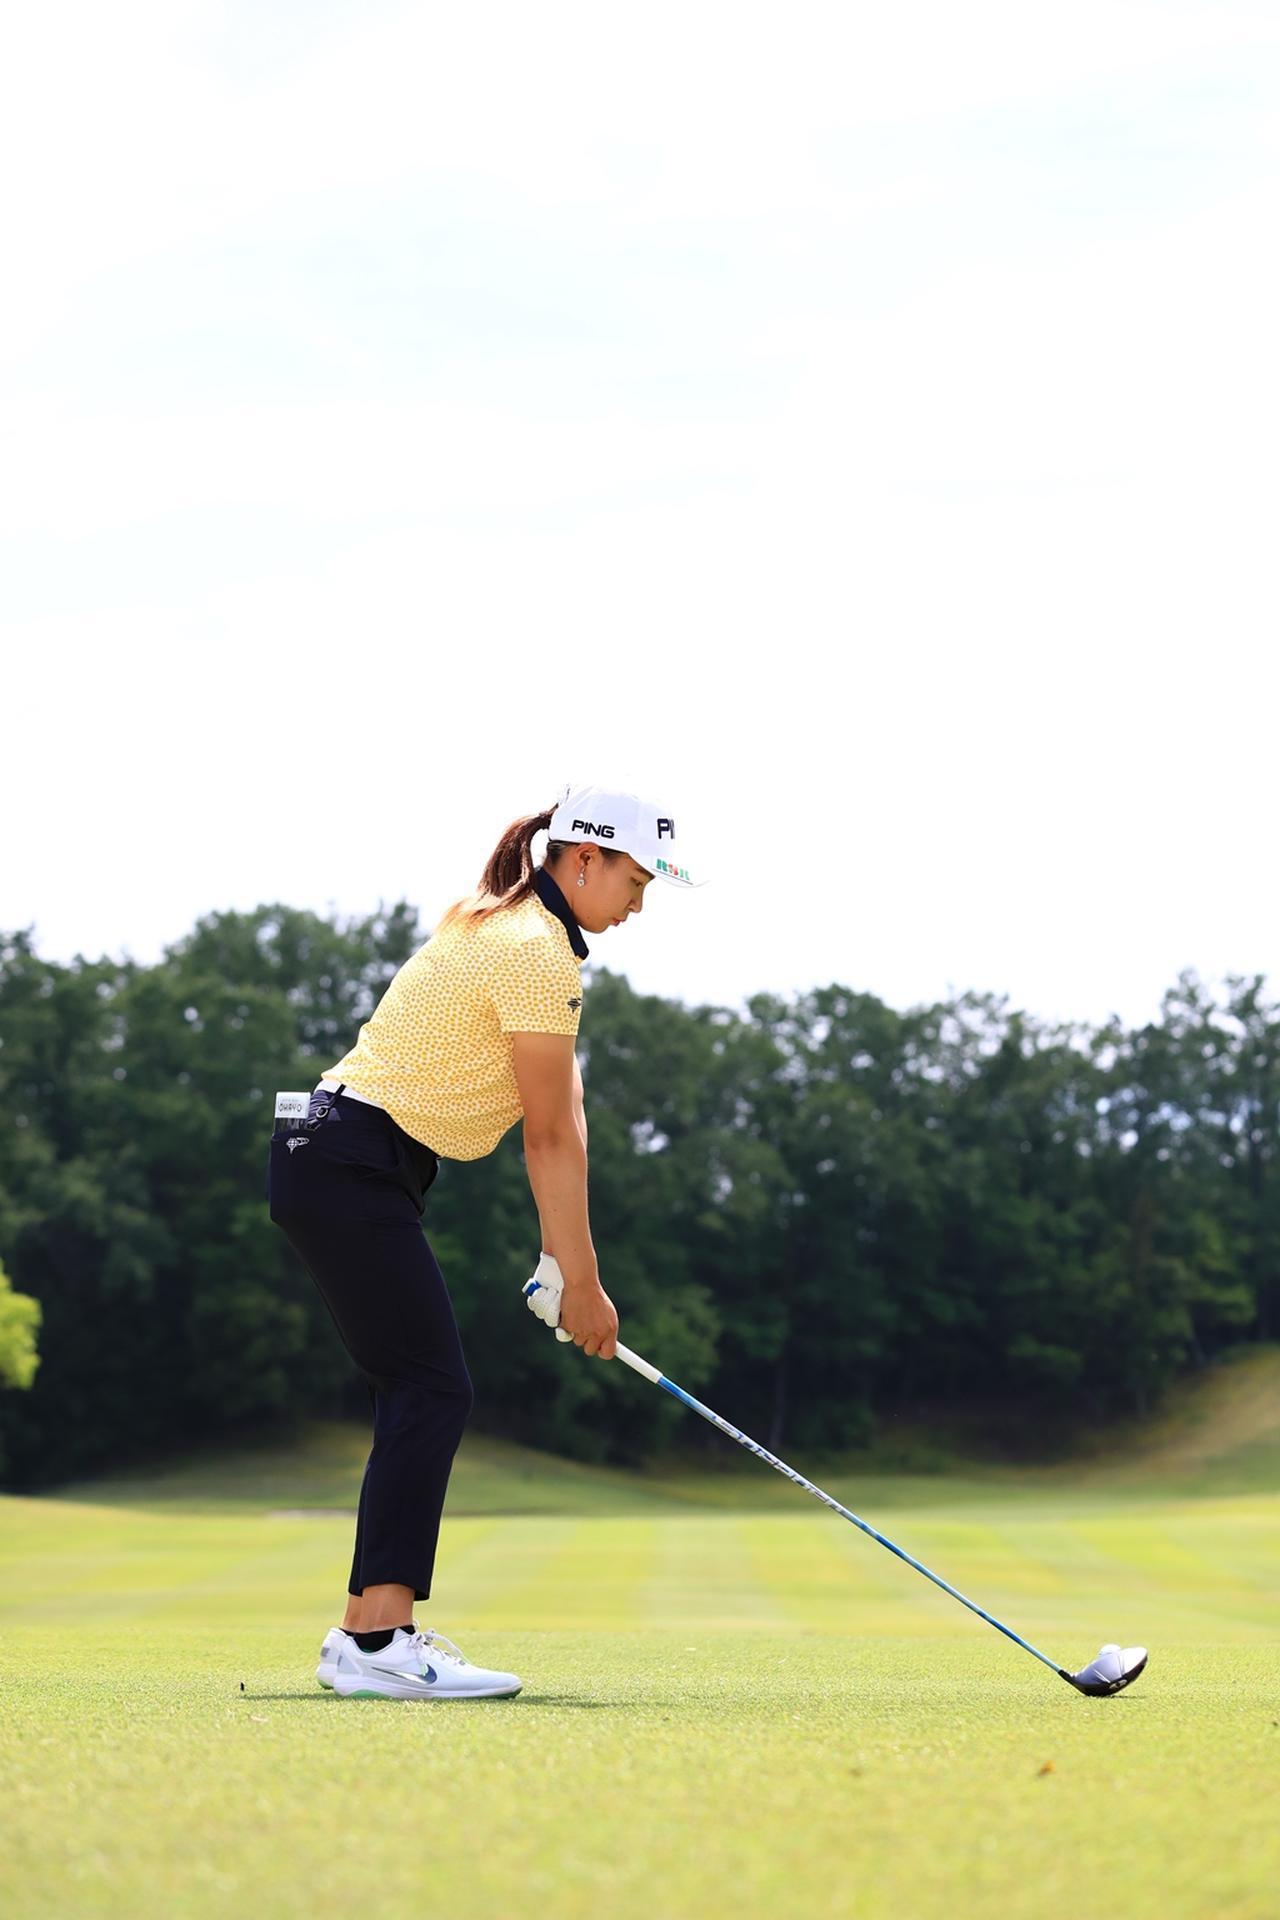 Images : 1番目の画像 - 渋野日向子のドライバー後方連続写真 - みんなのゴルフダイジェスト